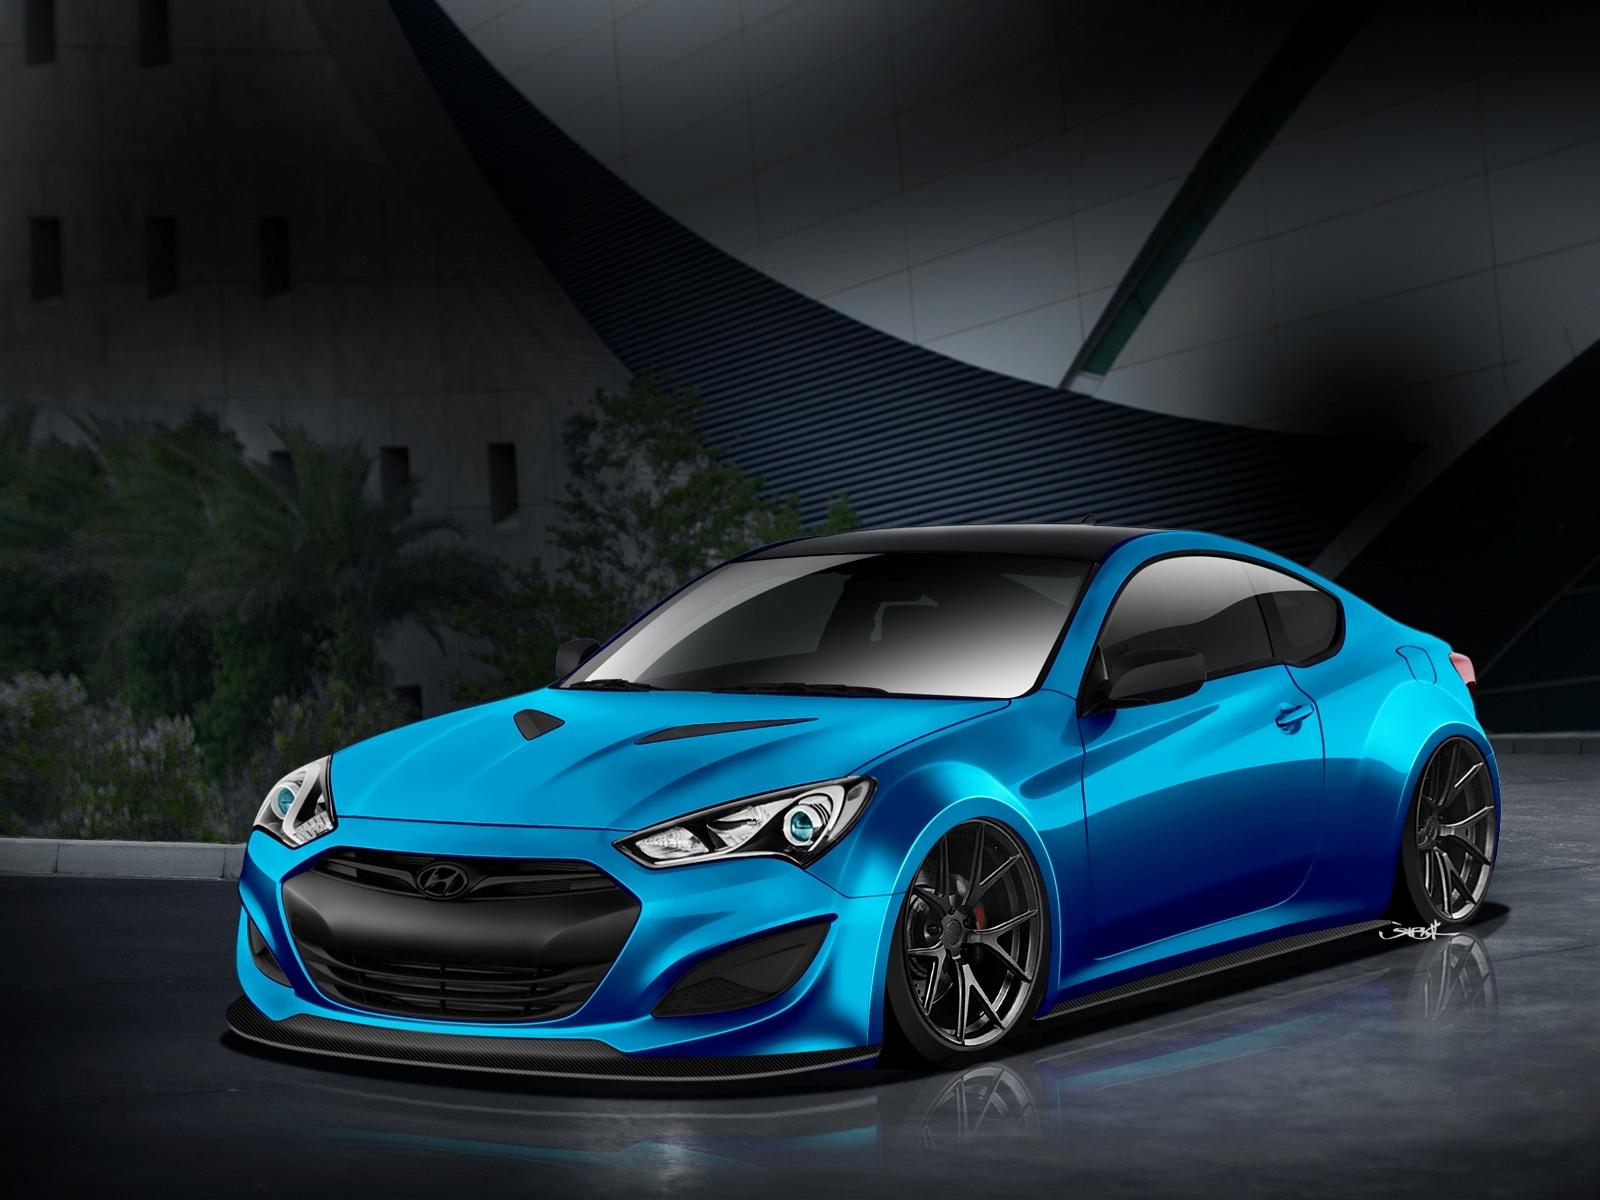 2017 Nissan Altima Sv >> Atlantic Blue Hyundai Genesis Coupe Will Make Waves At SEMA